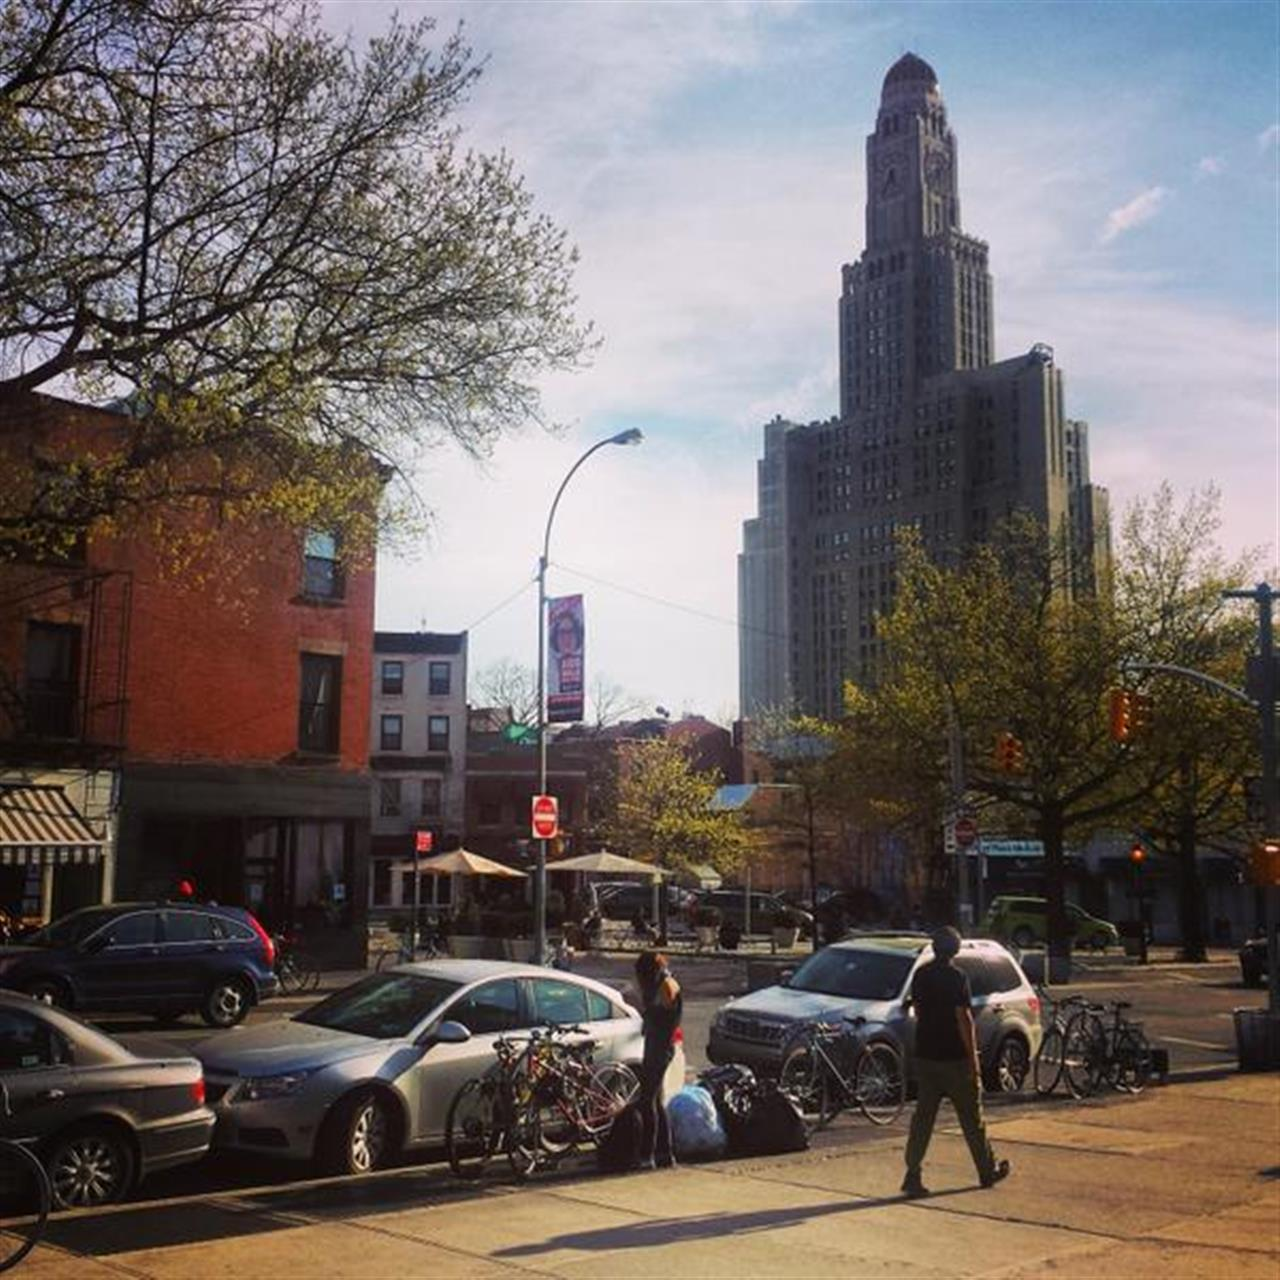 Scenes from Lafayette Avenue in Fort Greene #nyc #fortgreene #brooklyn #bkoriginal #leadingRElocal